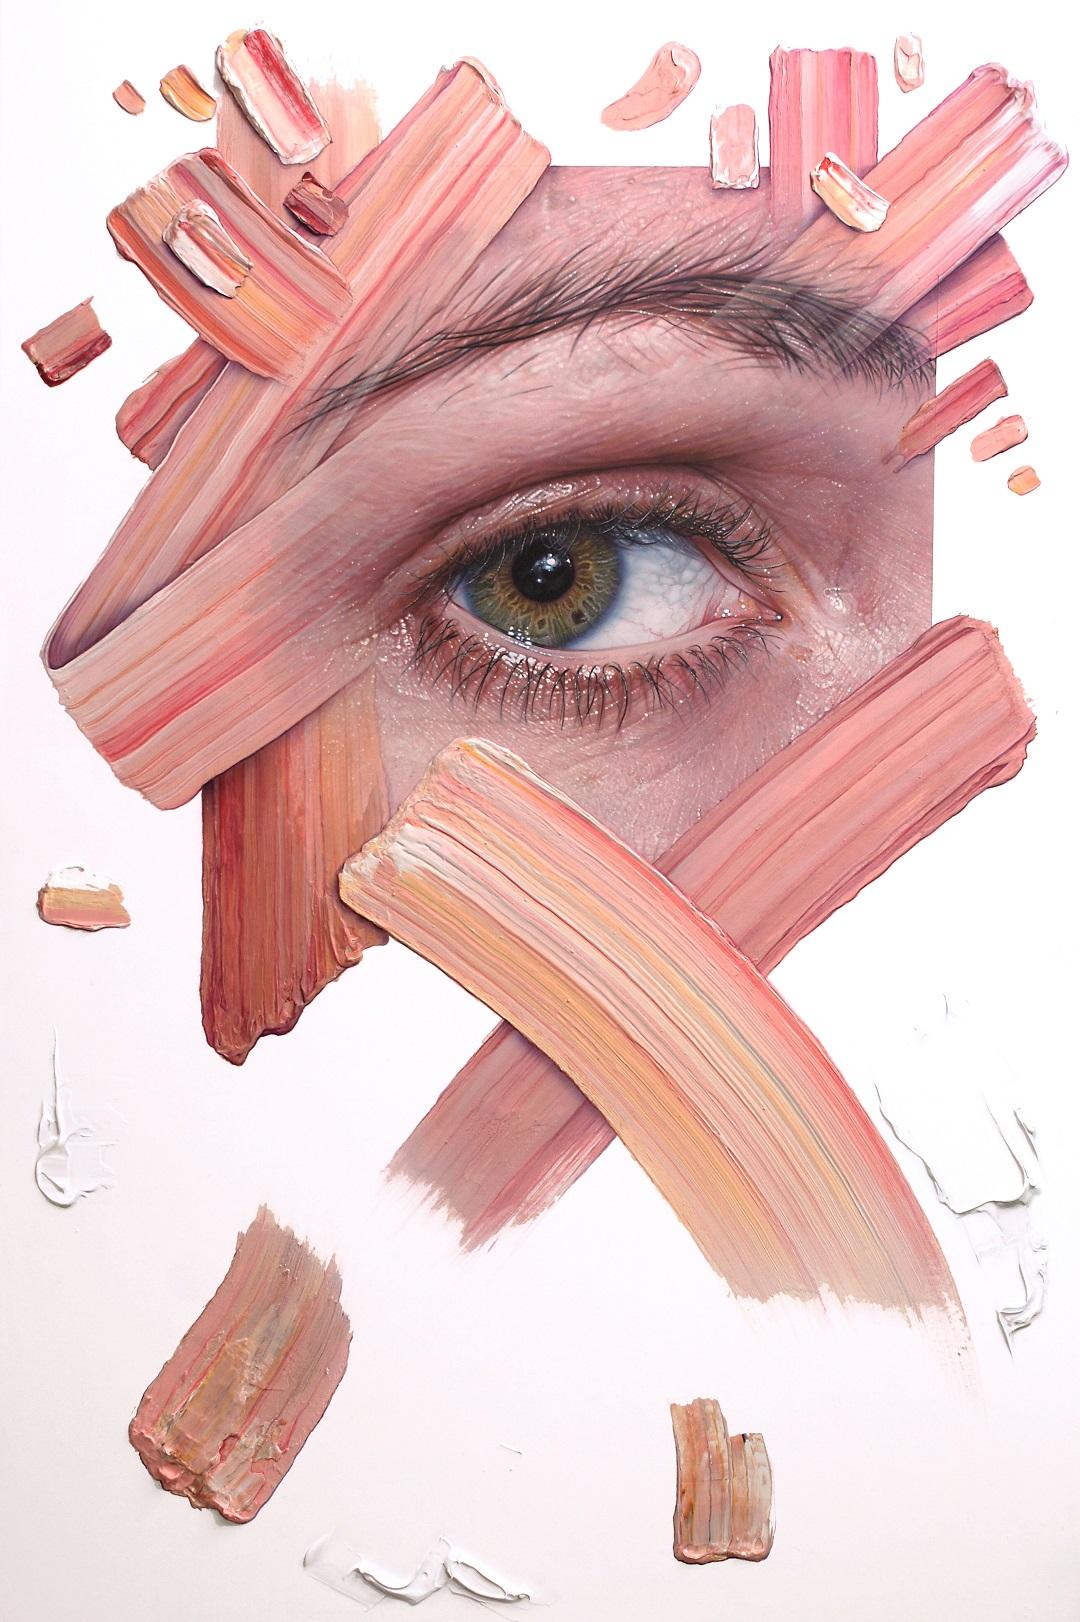 'A Meticulous Disorder' Simon Hennessey Acrylic on Panel, 96cmx 65cm, 2017